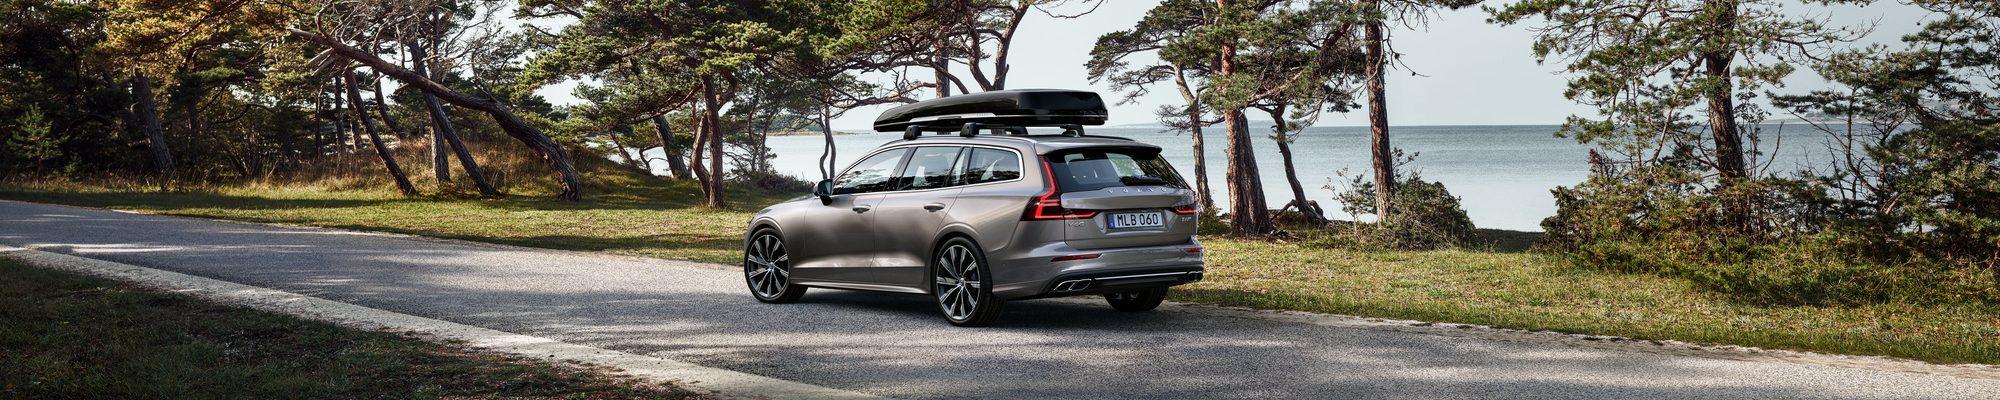 Volvo Bangarage Assistance